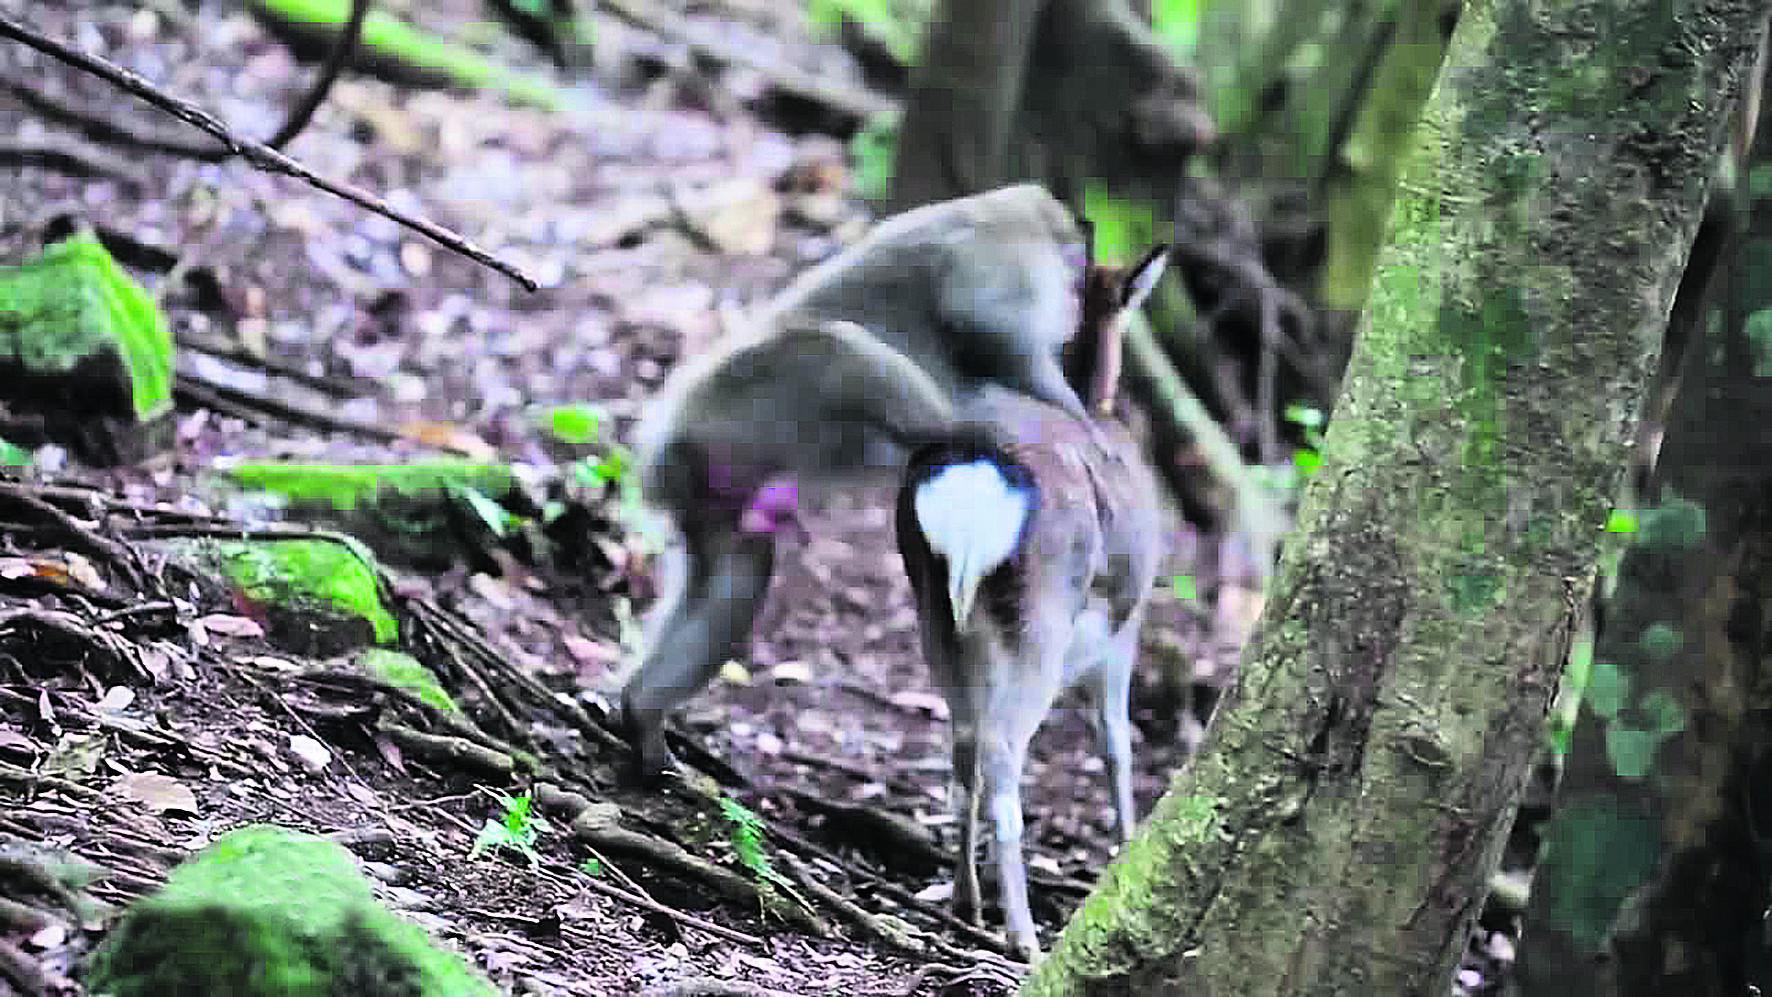 makakas-elafina-2 Ο παράφορος έρωτας του μακάκα με μια ελαφίνα [εικόνες & βίντεο]